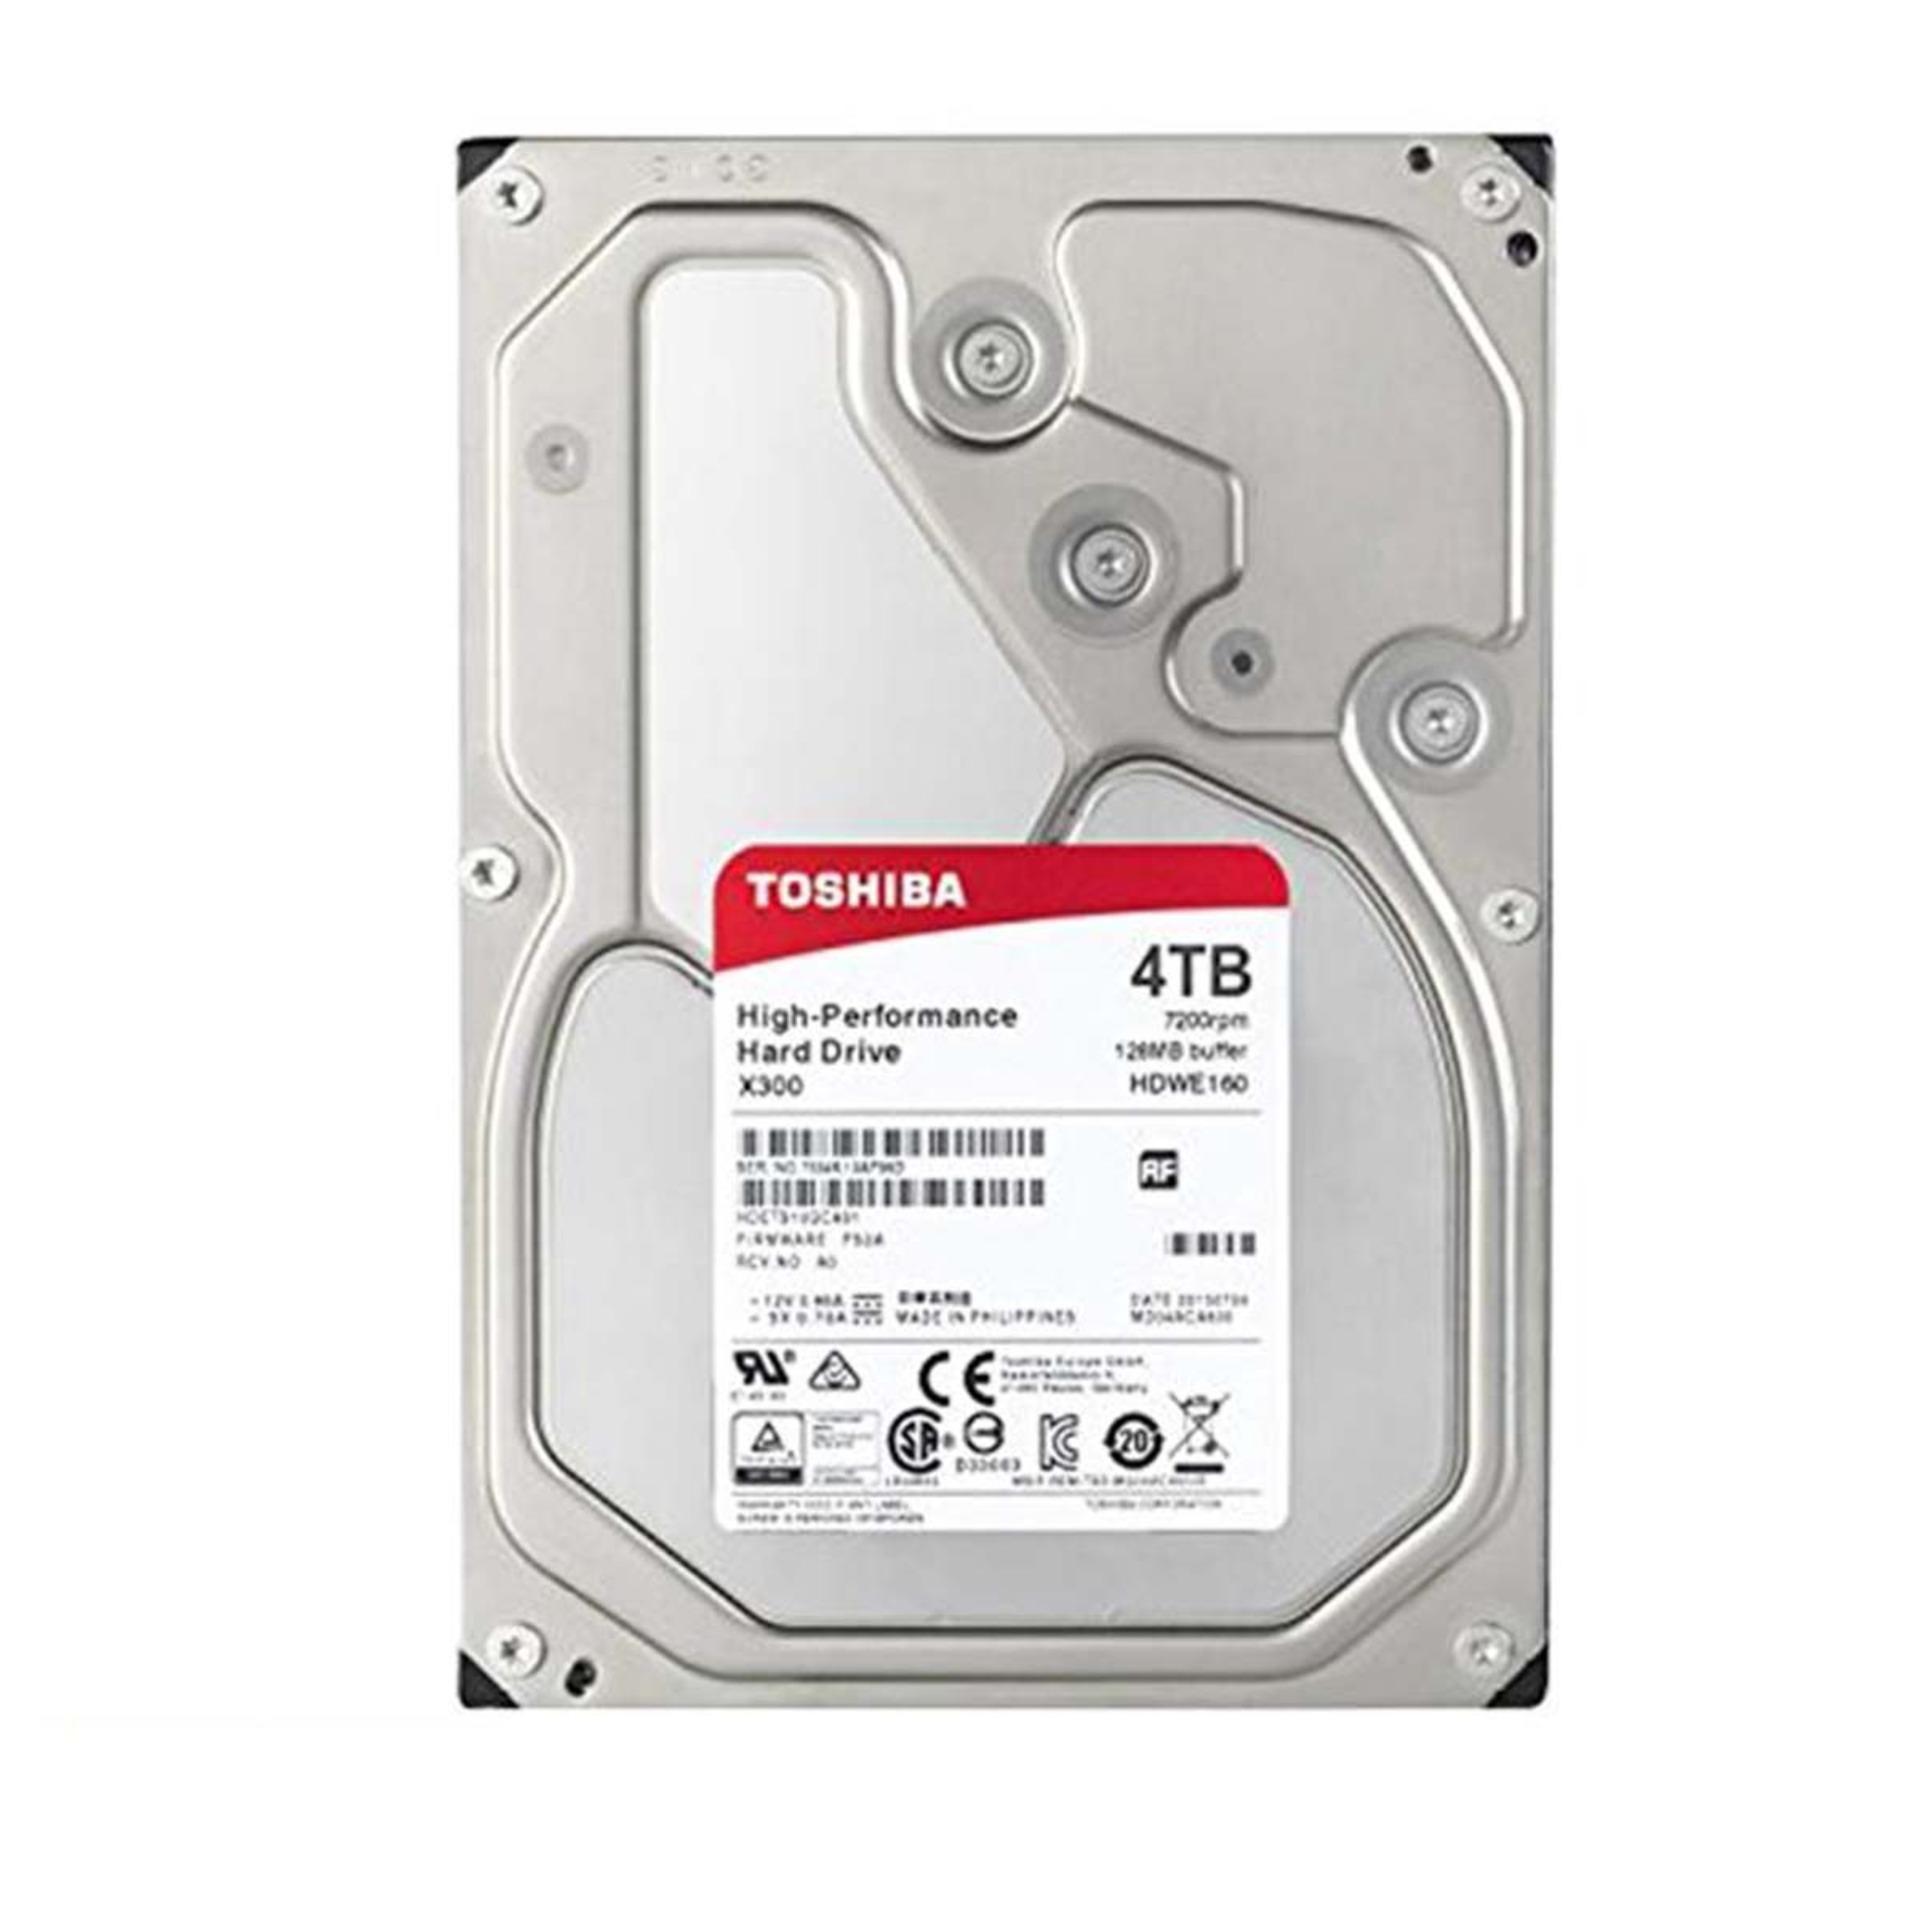 Ssd Price In Bangladesh Buy Hard Disk Online Hdd Harddisk Internal Wd Blue 1tb 35 Sata 3 7200 Rpm Hardisk 1 Tb Desktop 4tb Silver